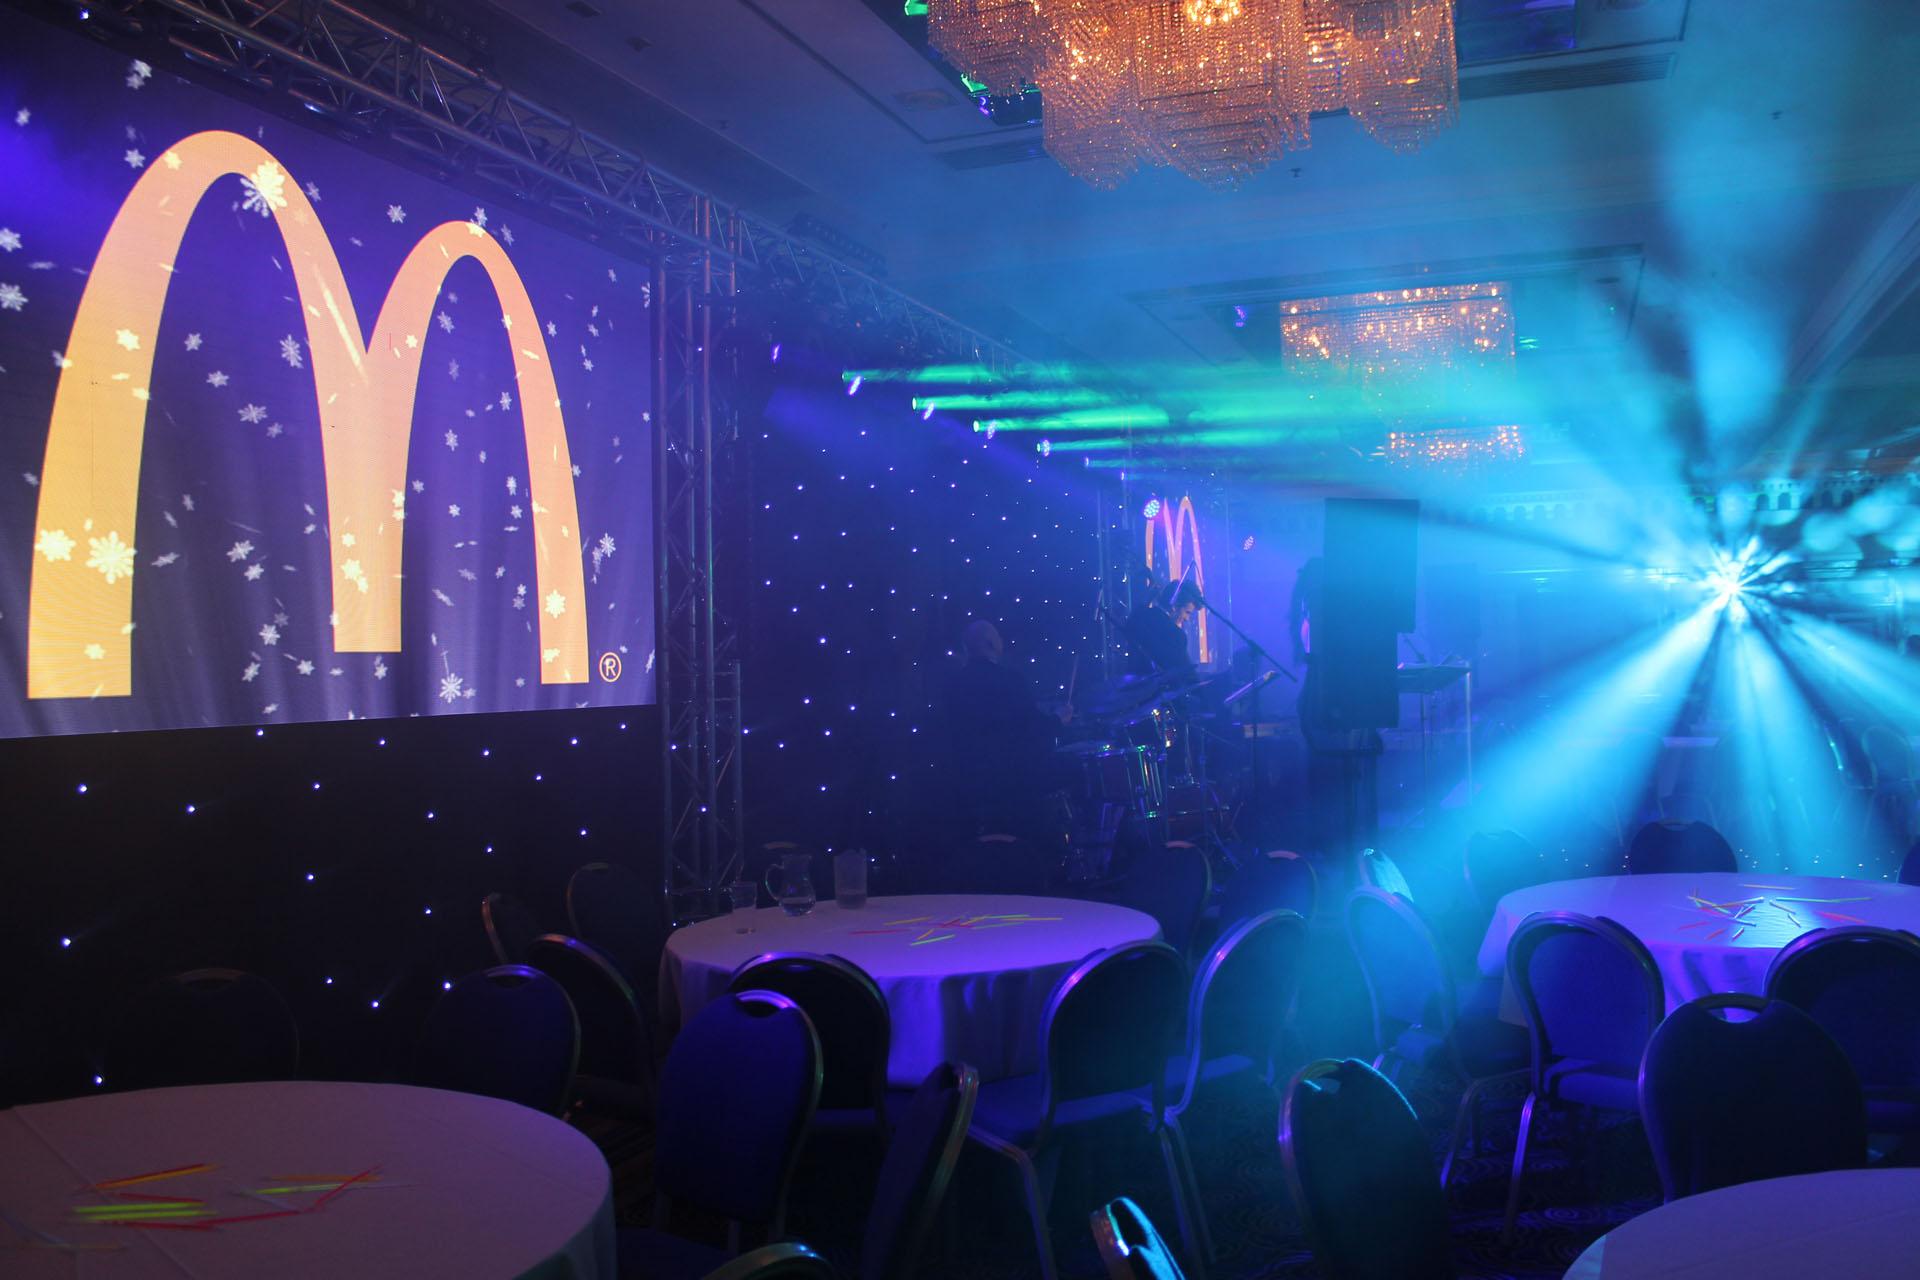 MacDonald's Christmas Awards Ceremony 2015